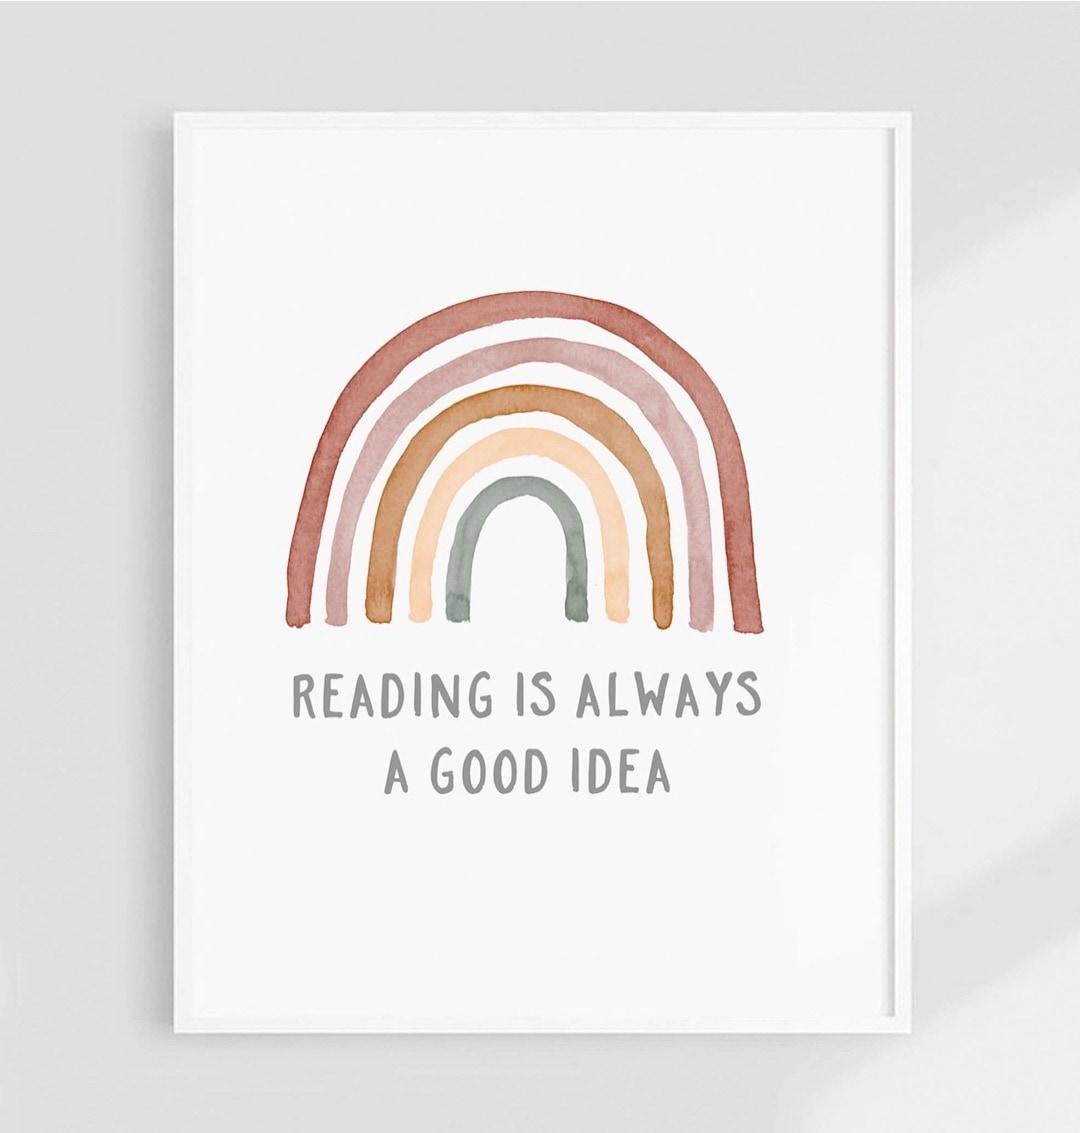 Reading is always a good idea